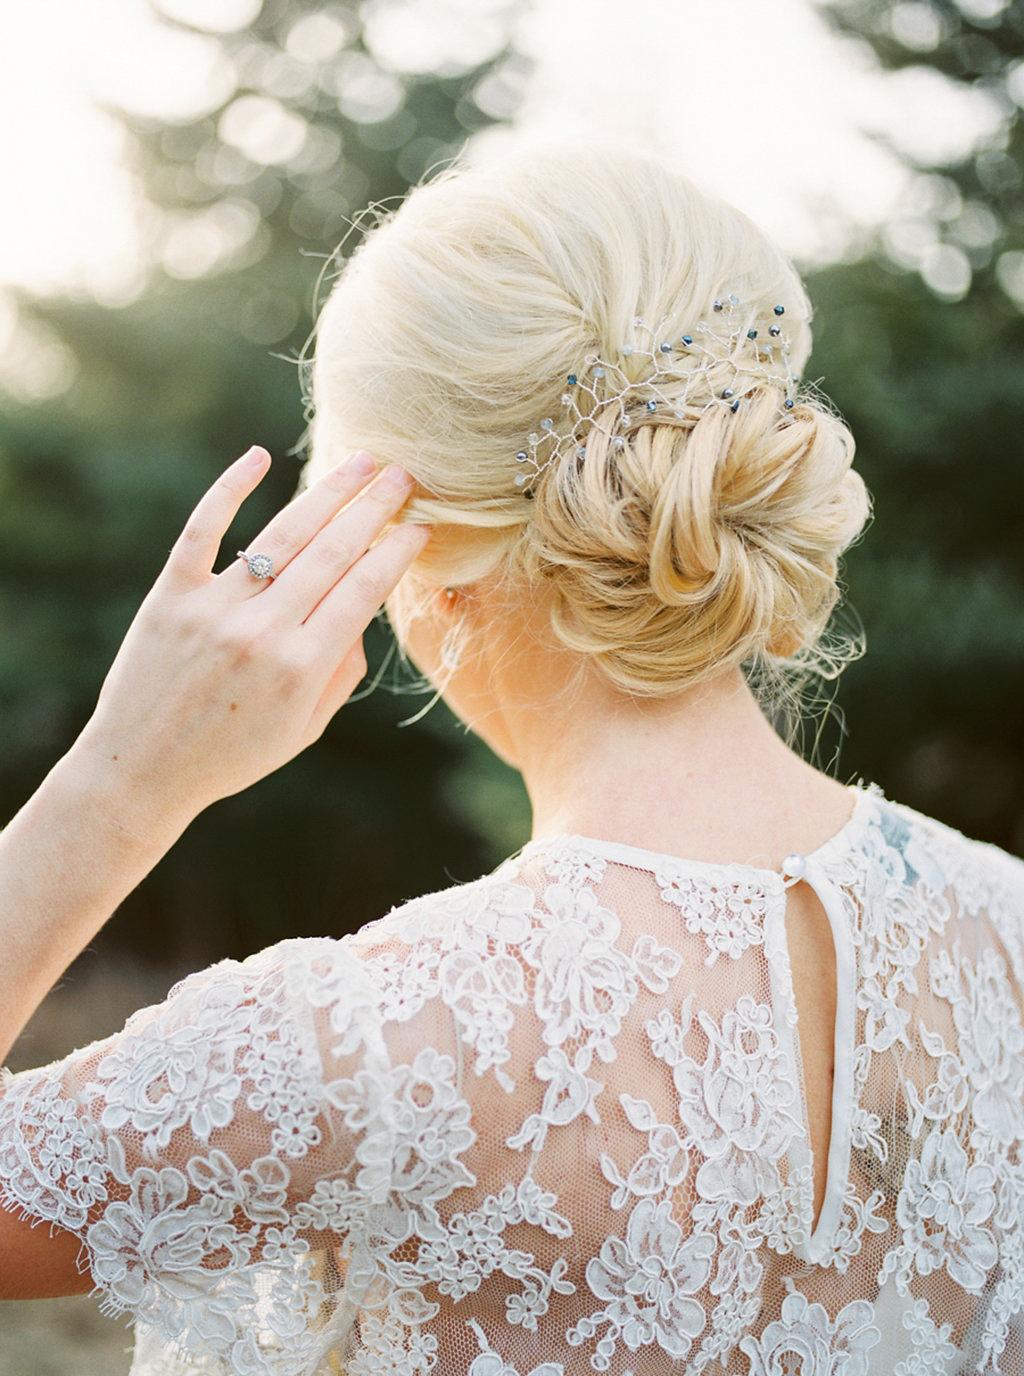 kayla-yestal-photography-vineyard-bride-swish-list-beamer-falls-manor-grimsby-engagement-14.jpg